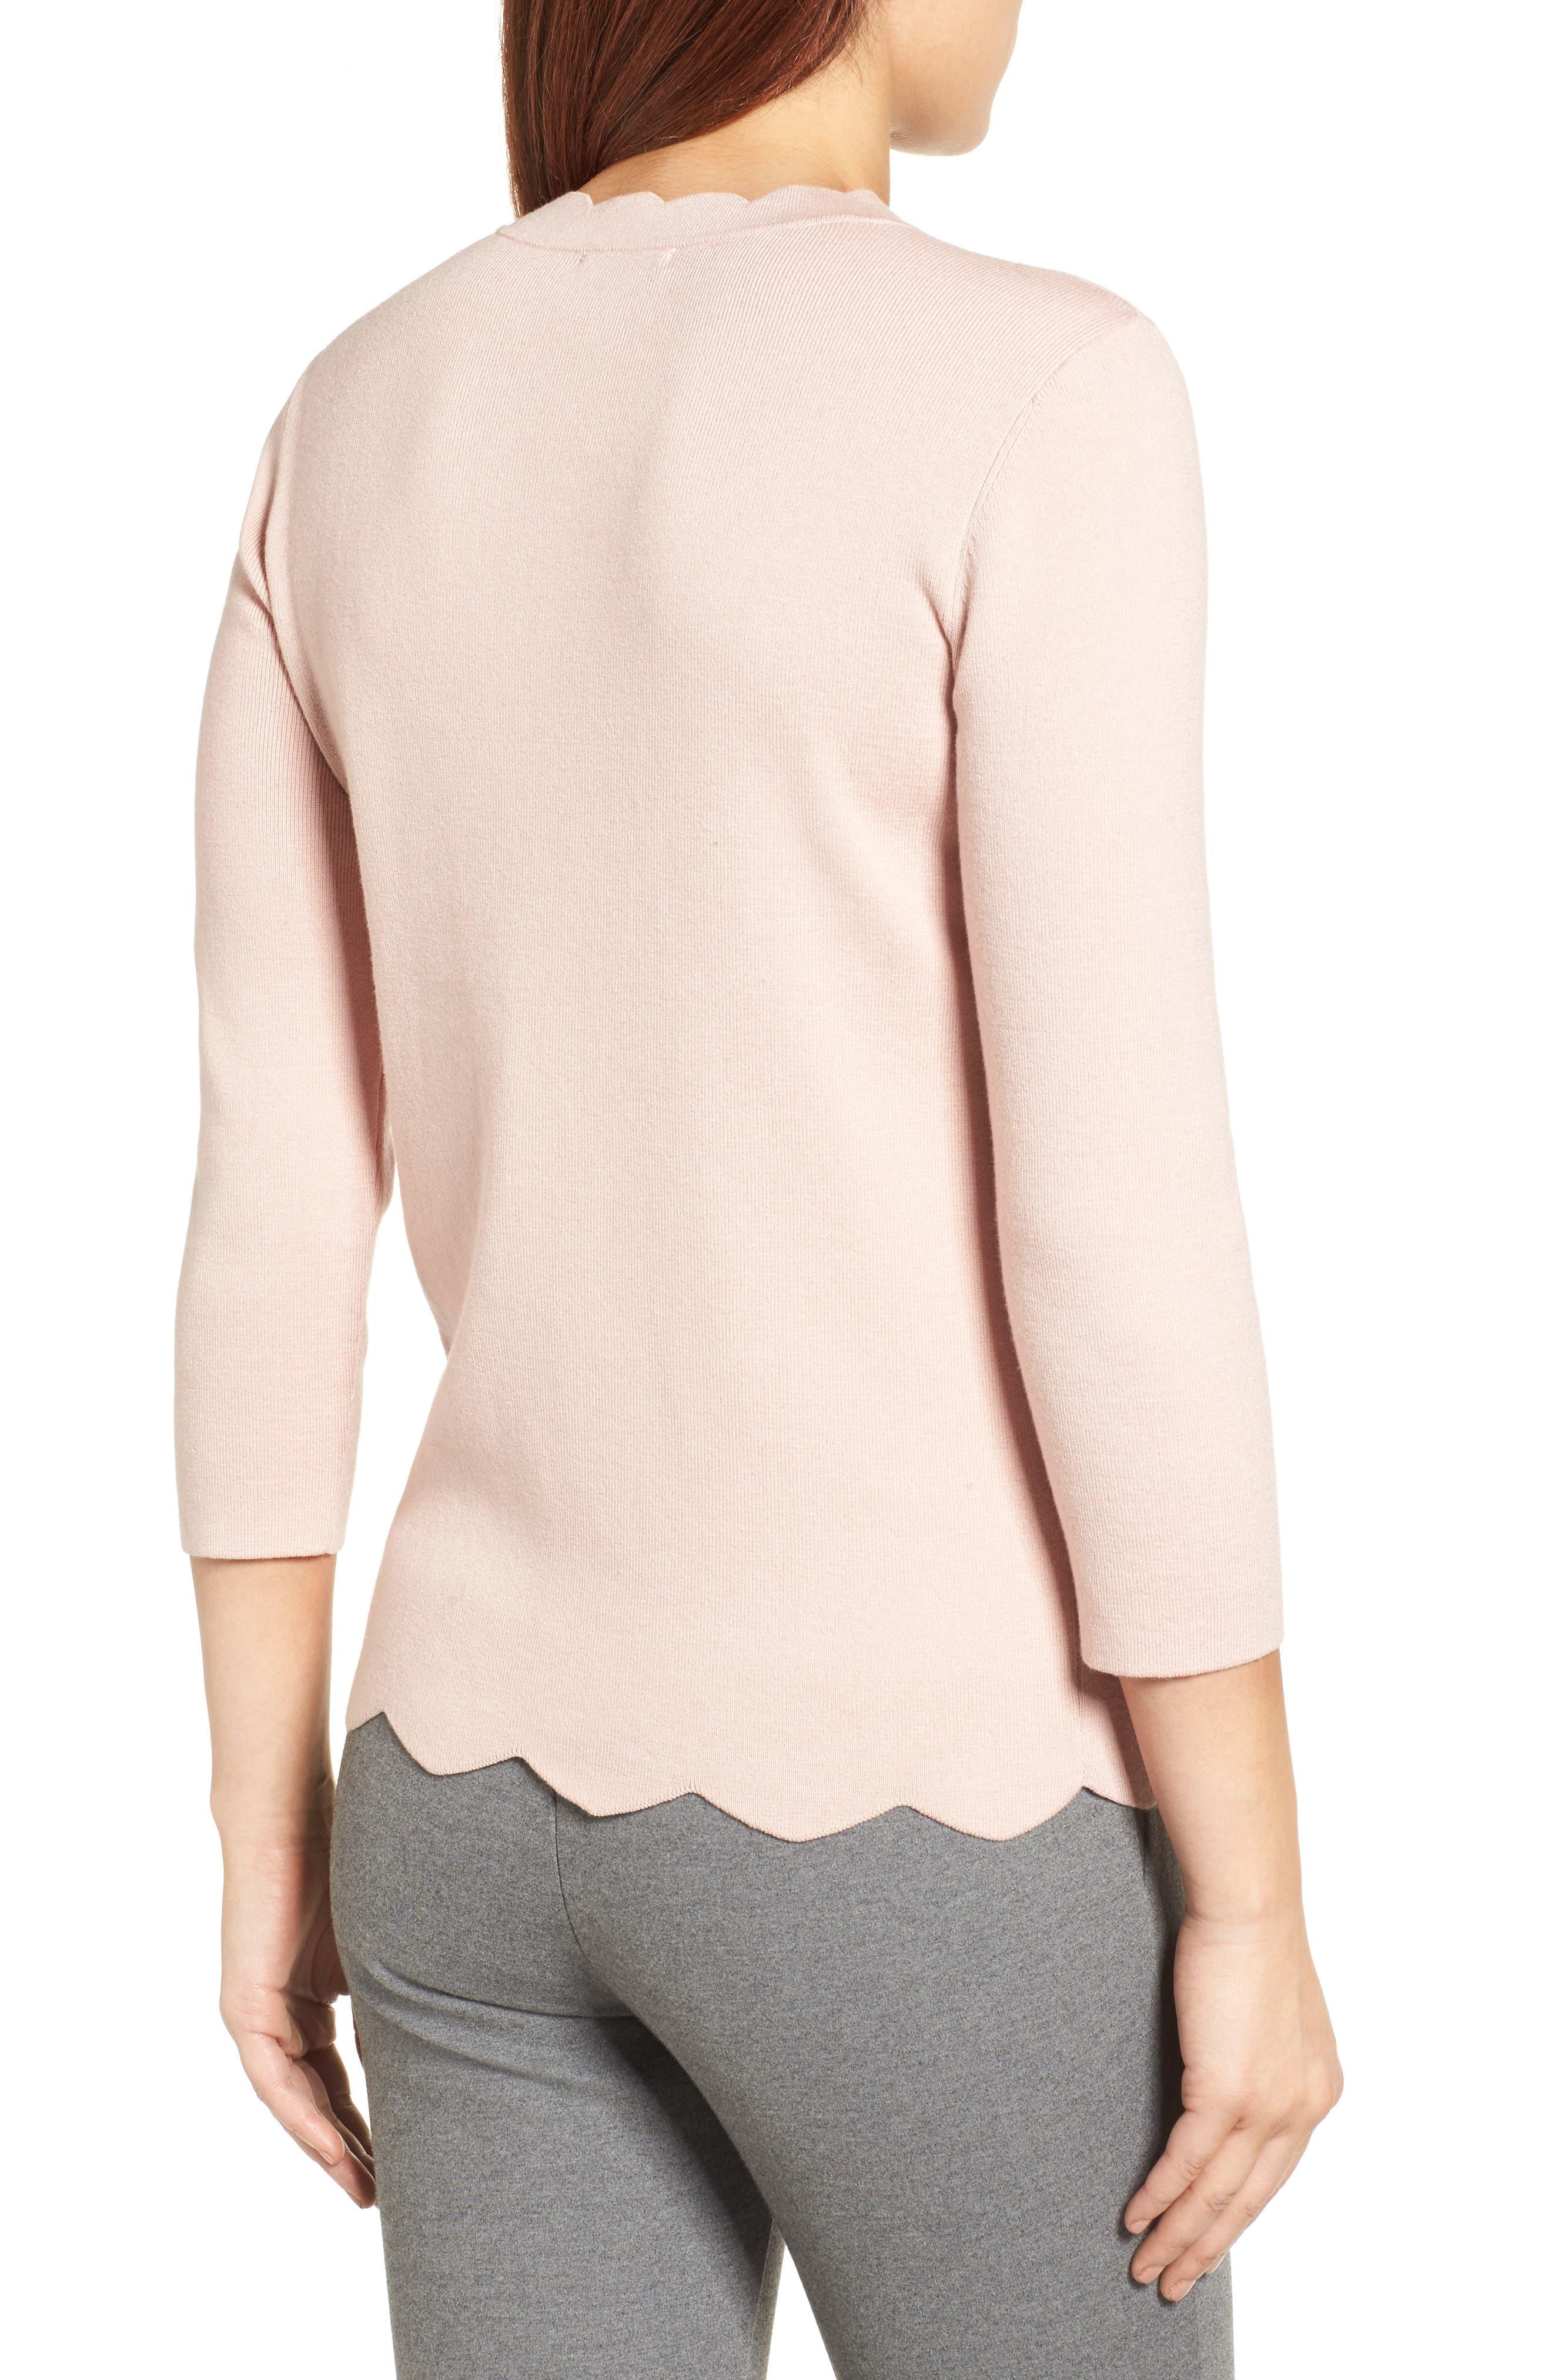 Alternate Image 2  - Halogen Scallop Edge Sweater (Regular & Petite)